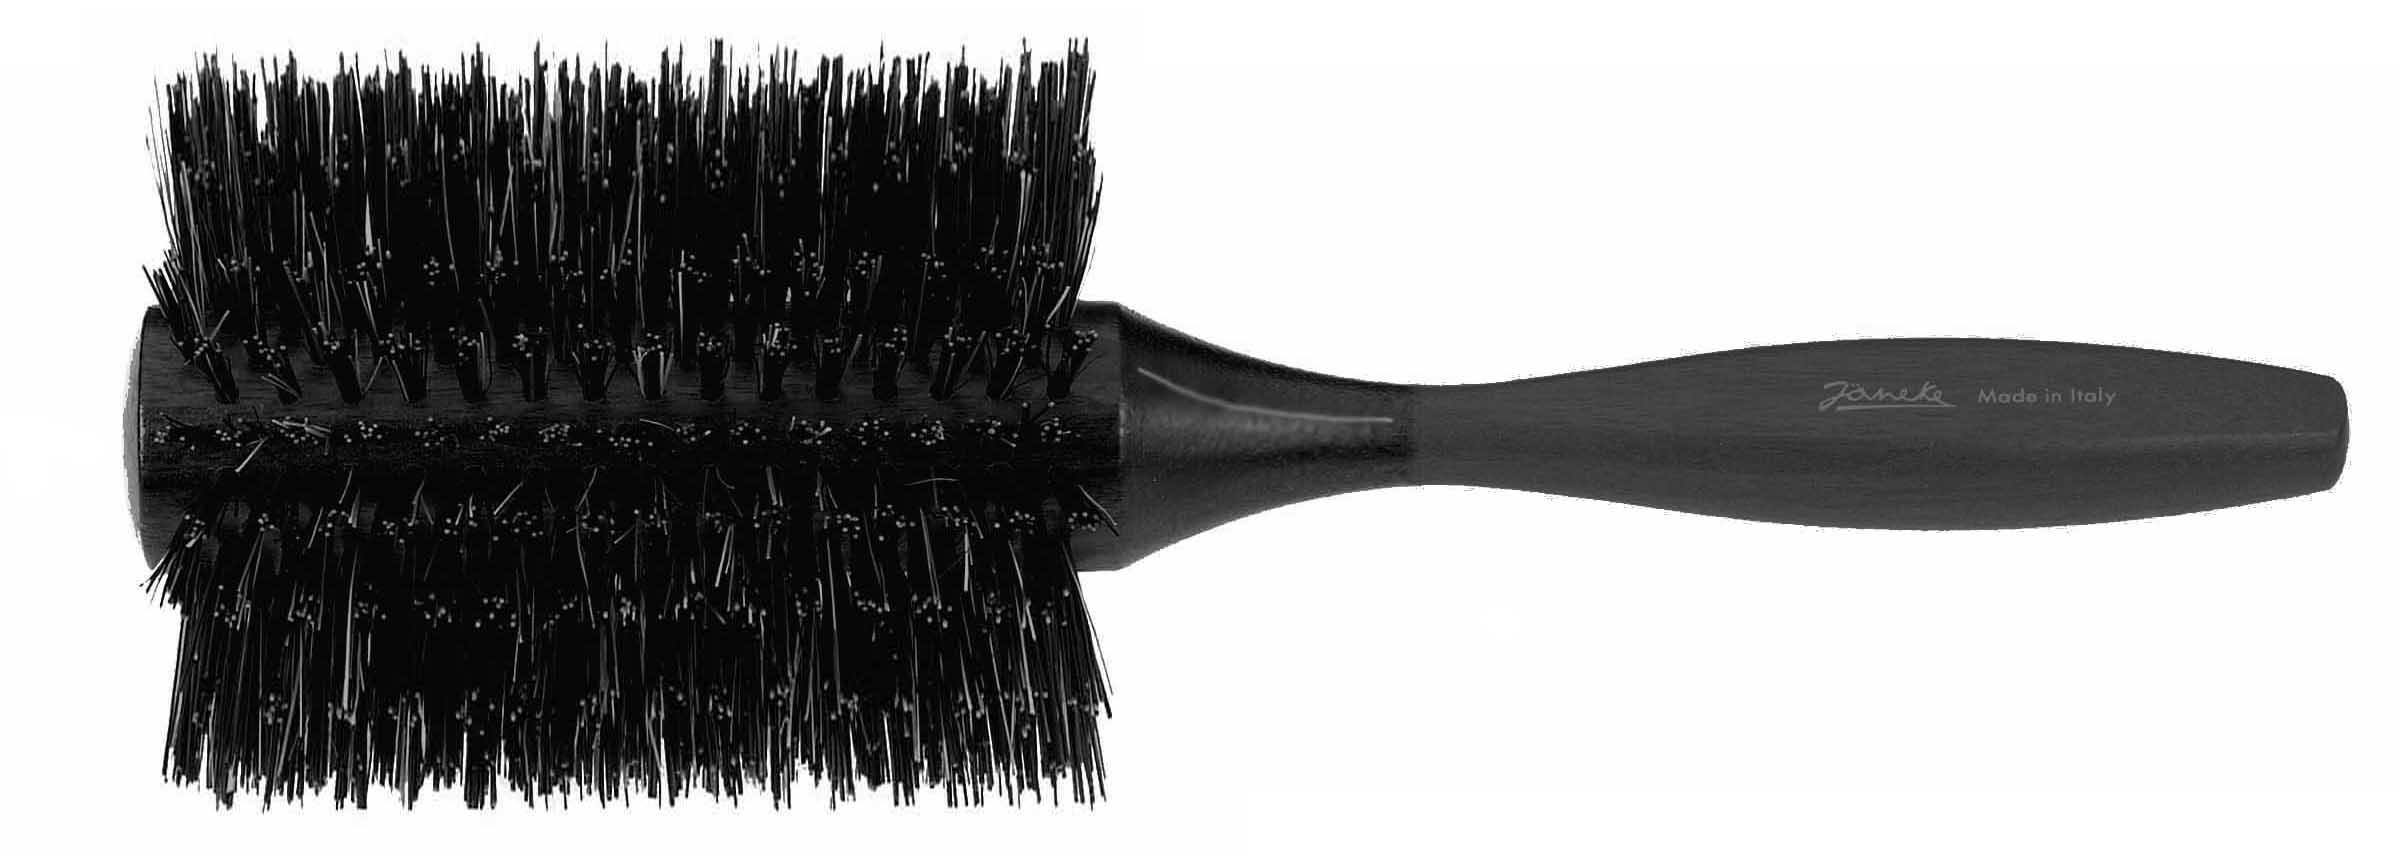 Professional round hair-brush Diameter mm 70 Cod. SP385V